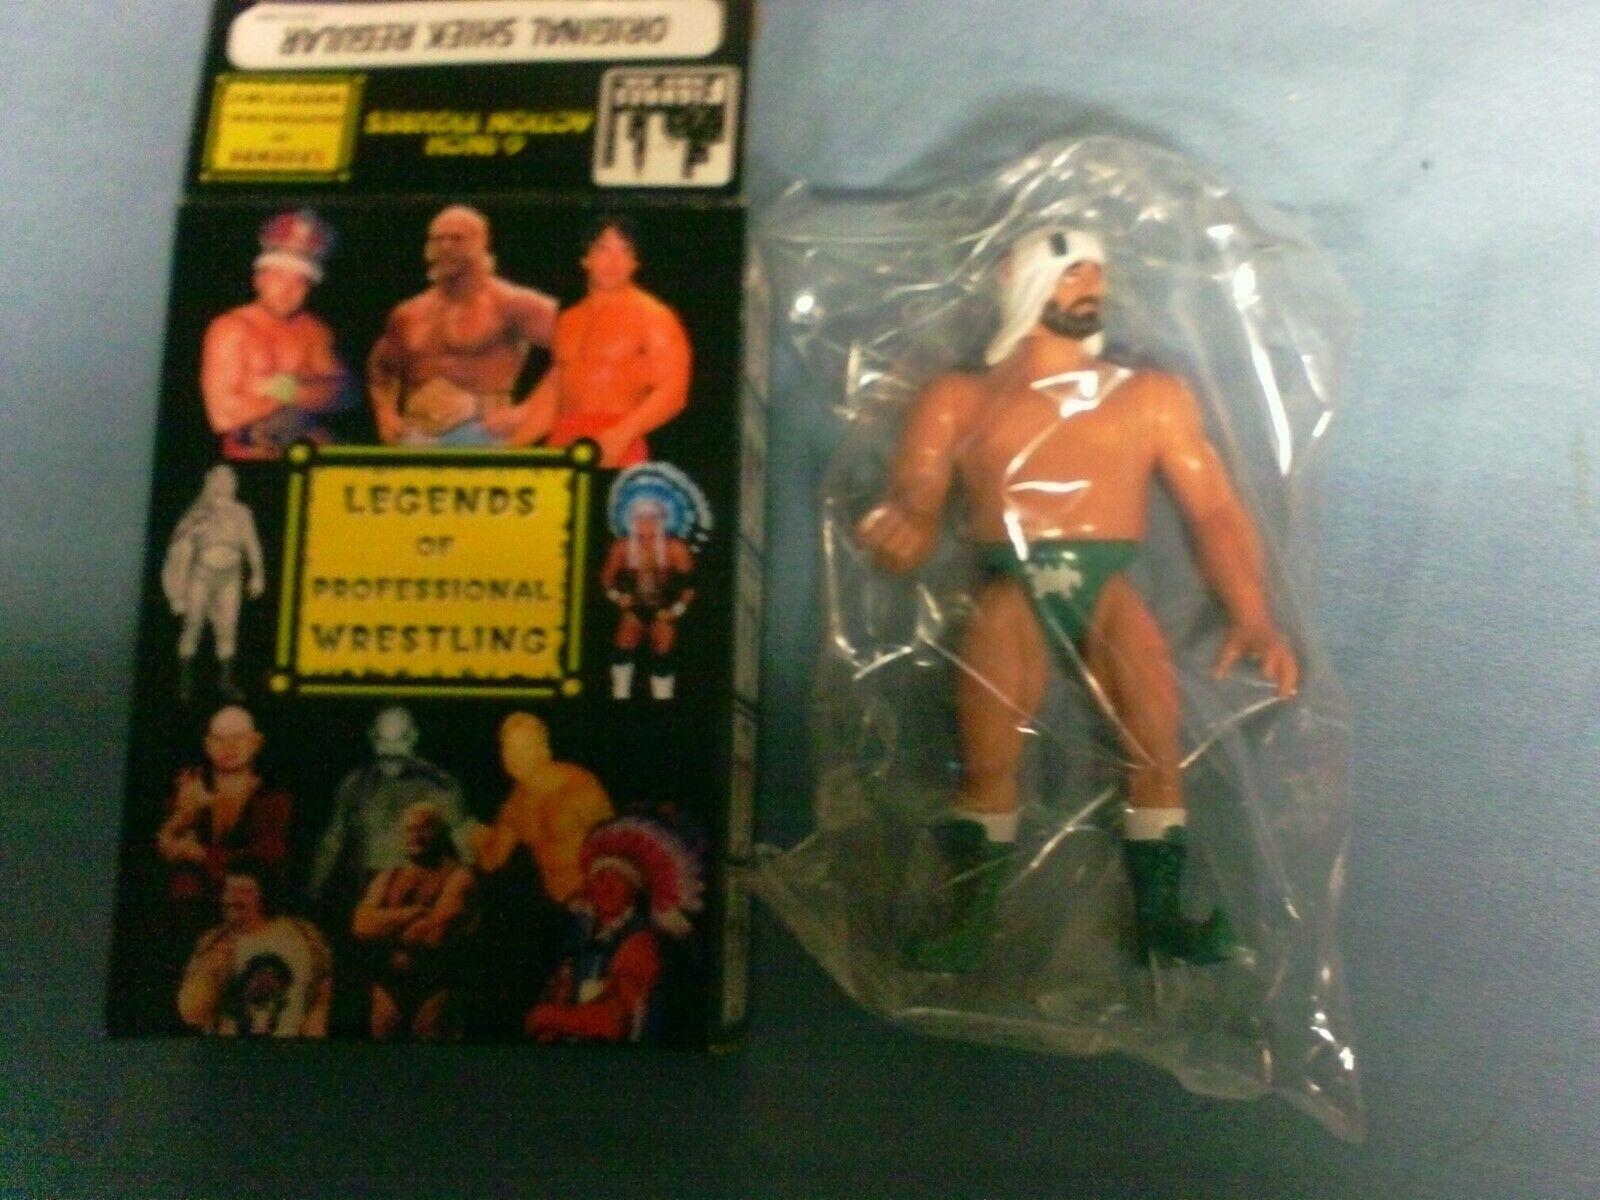 ORIGINAL SHEIK REGULAR Legends of Professional Wrestling FACTORY SEALED IN BOX